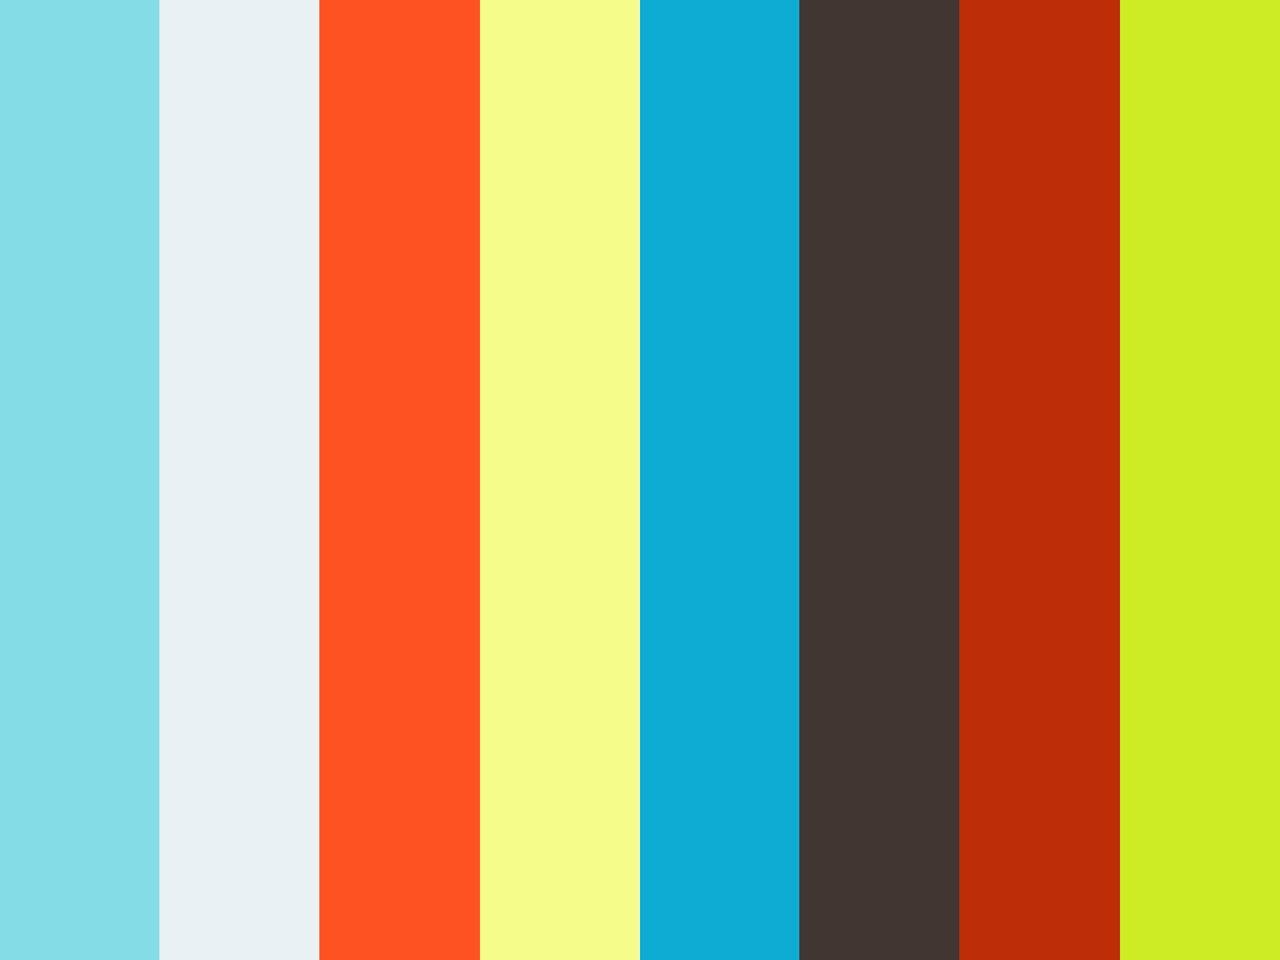 Timelapse Fábrica Indaiá - agosto/2014 a outubro/2015 - 15 meses